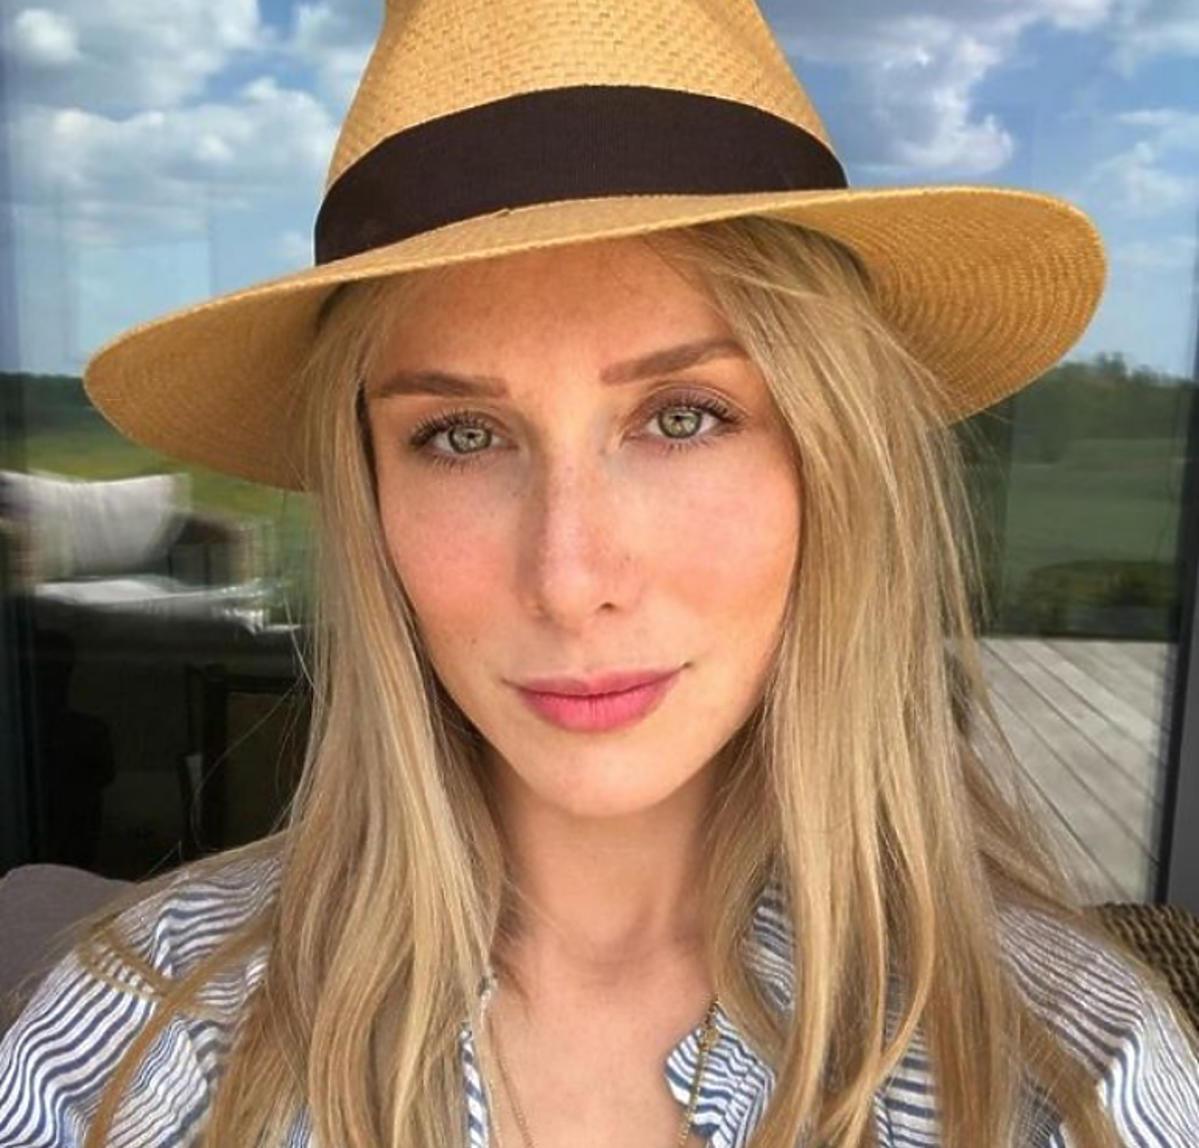 Natalia Klimas w kapeluszu